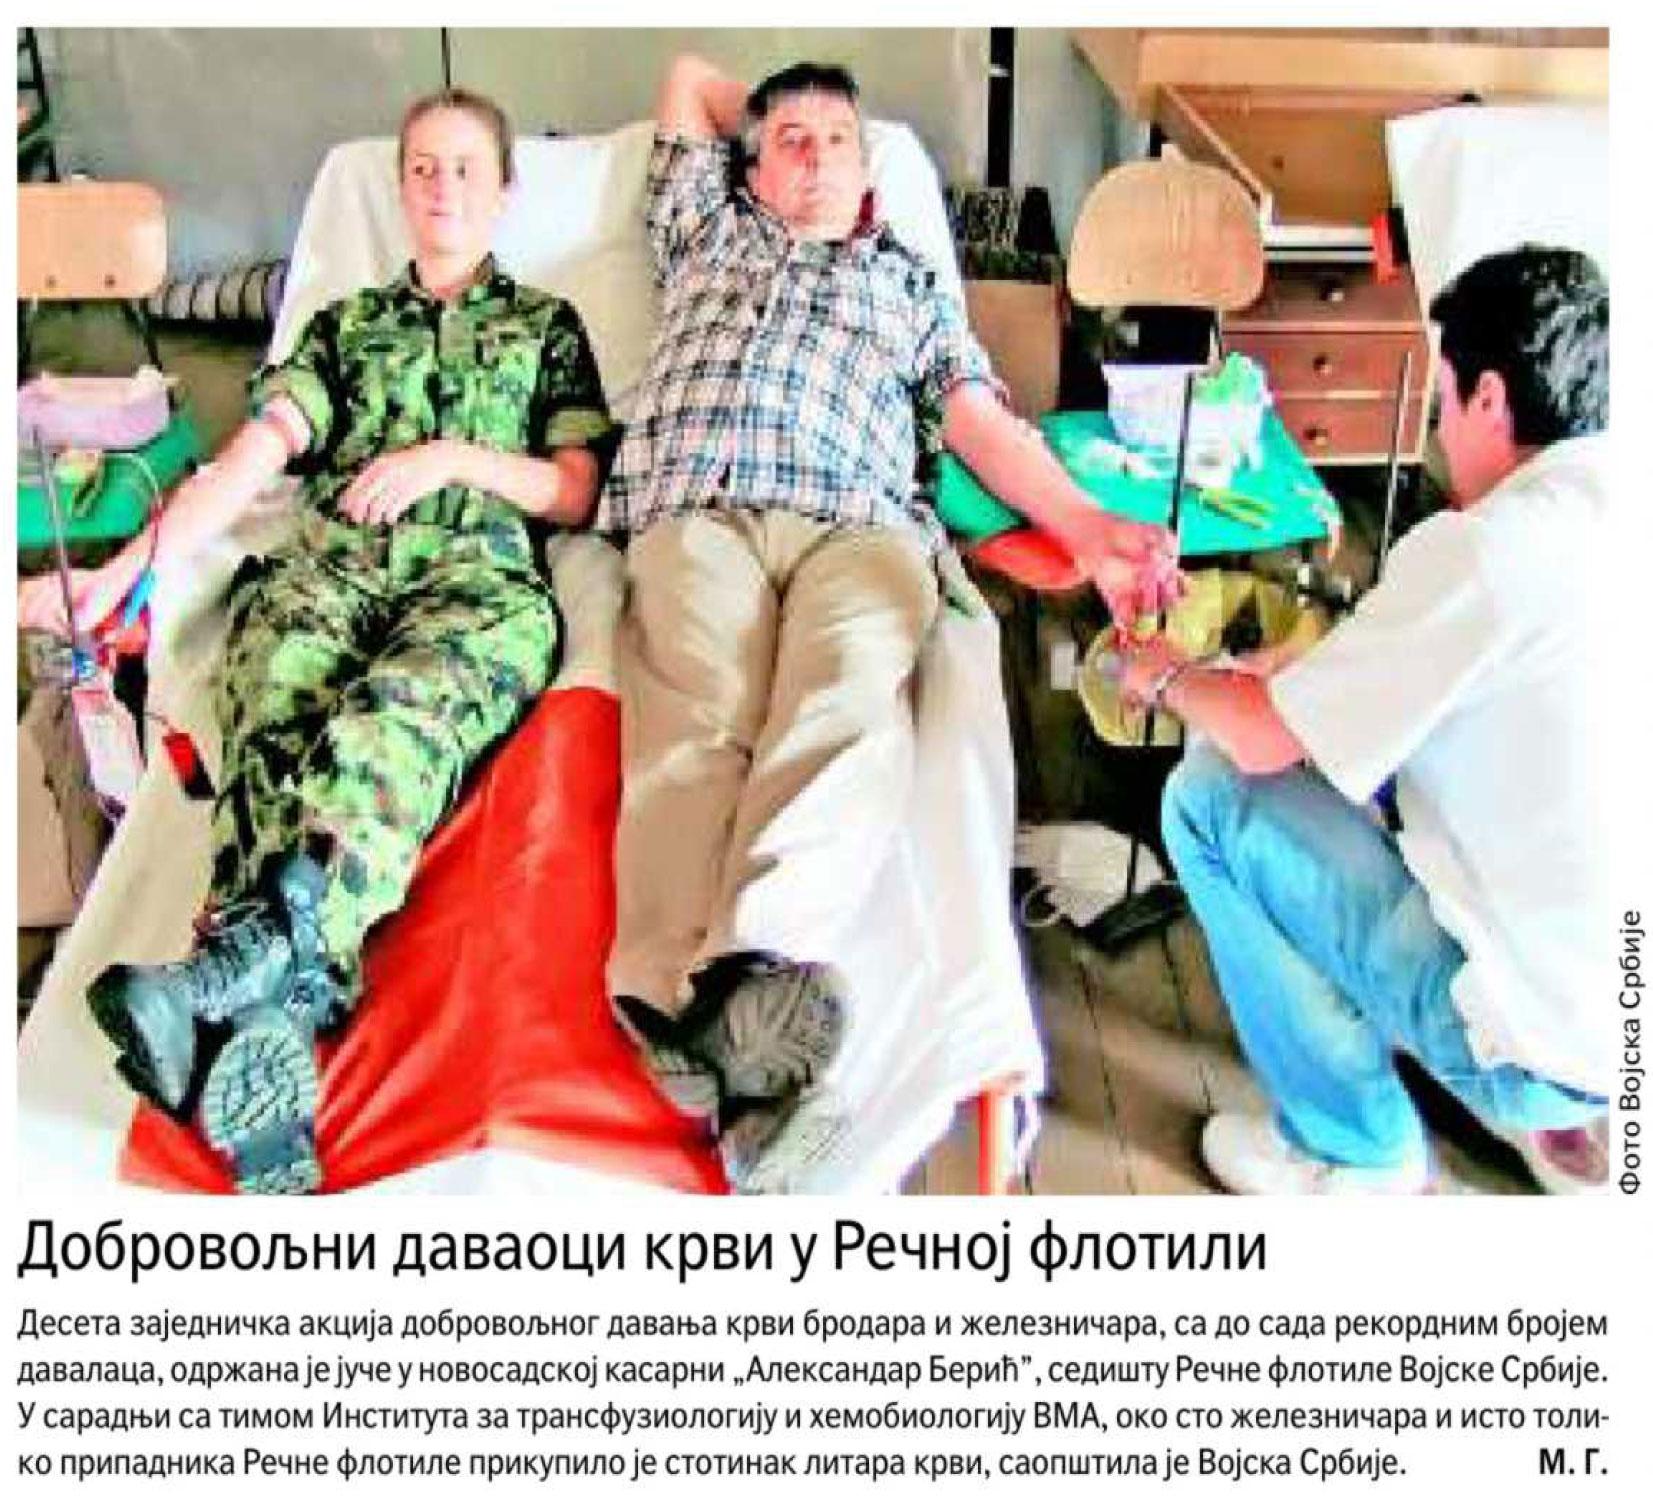 Добровољни даваоци крви у Речној флотили